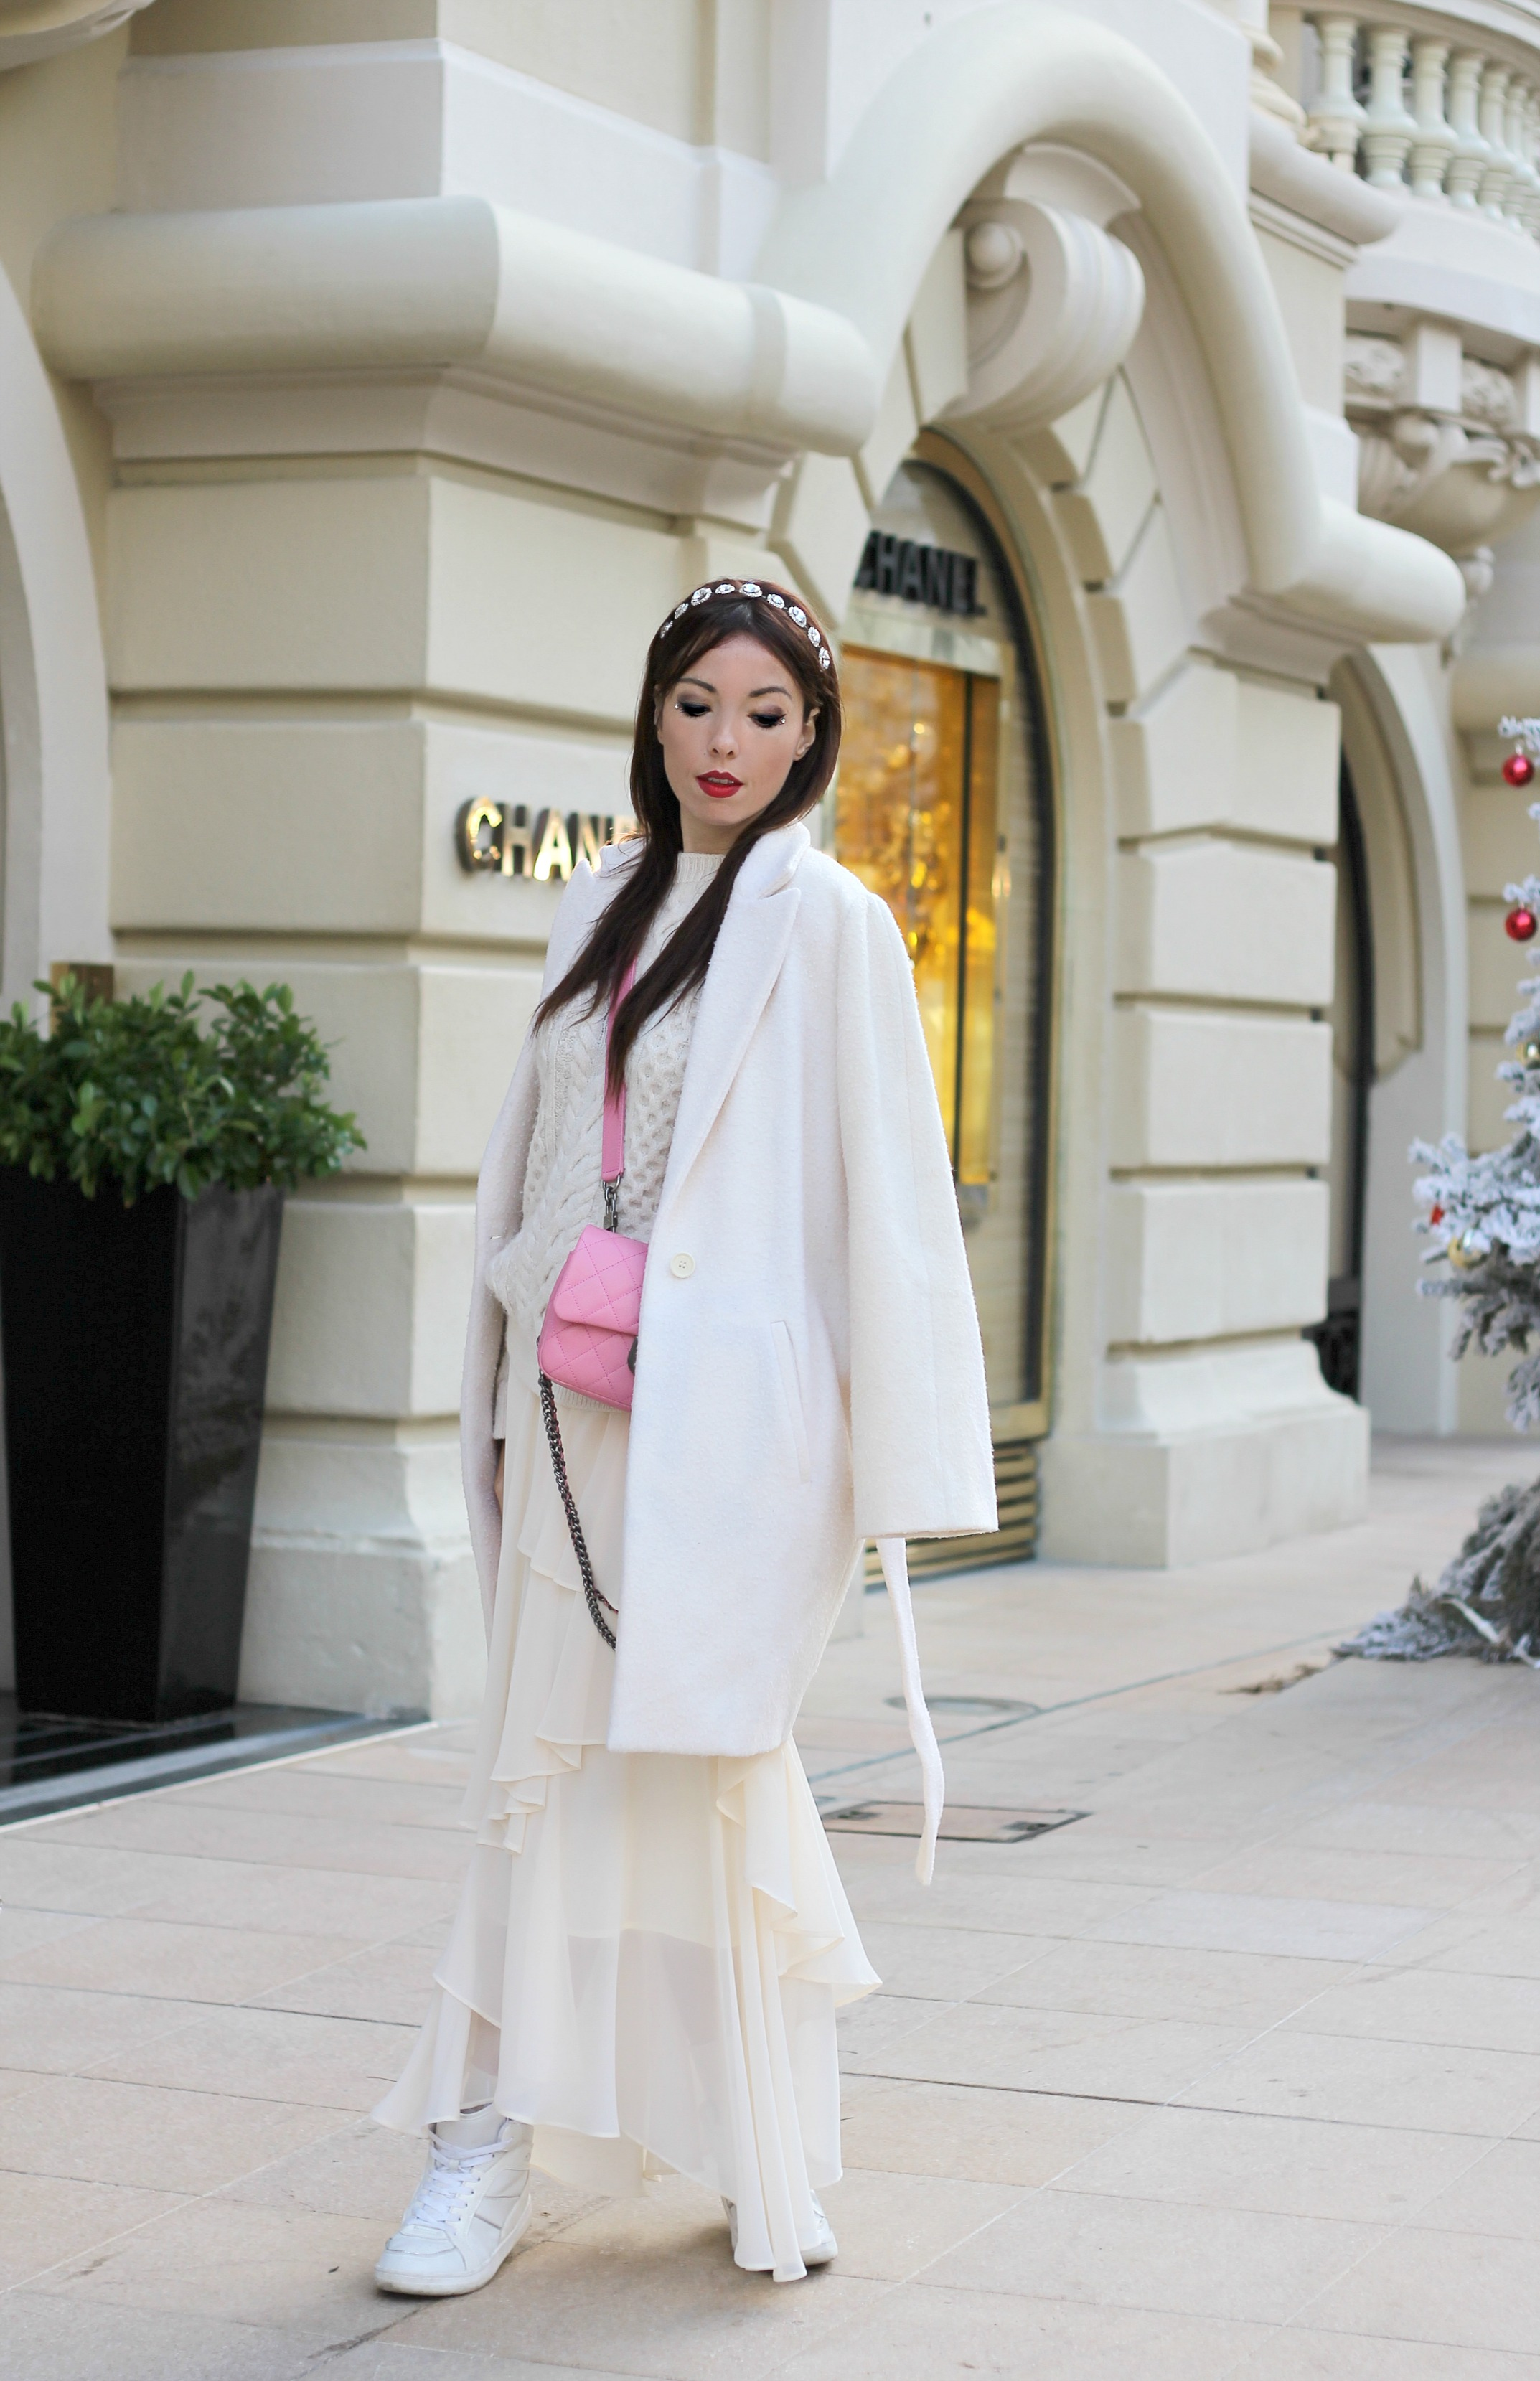 theladycracy.it, elisa bellino, fashion blogger italiane, fashion blogger winter outfit,prospettive lavoro futuro, total white look, zarina outfit, chanel rosa borsa,prospettive lavoro futuro, total white look, zarina outfit, chanel rosa borsa,